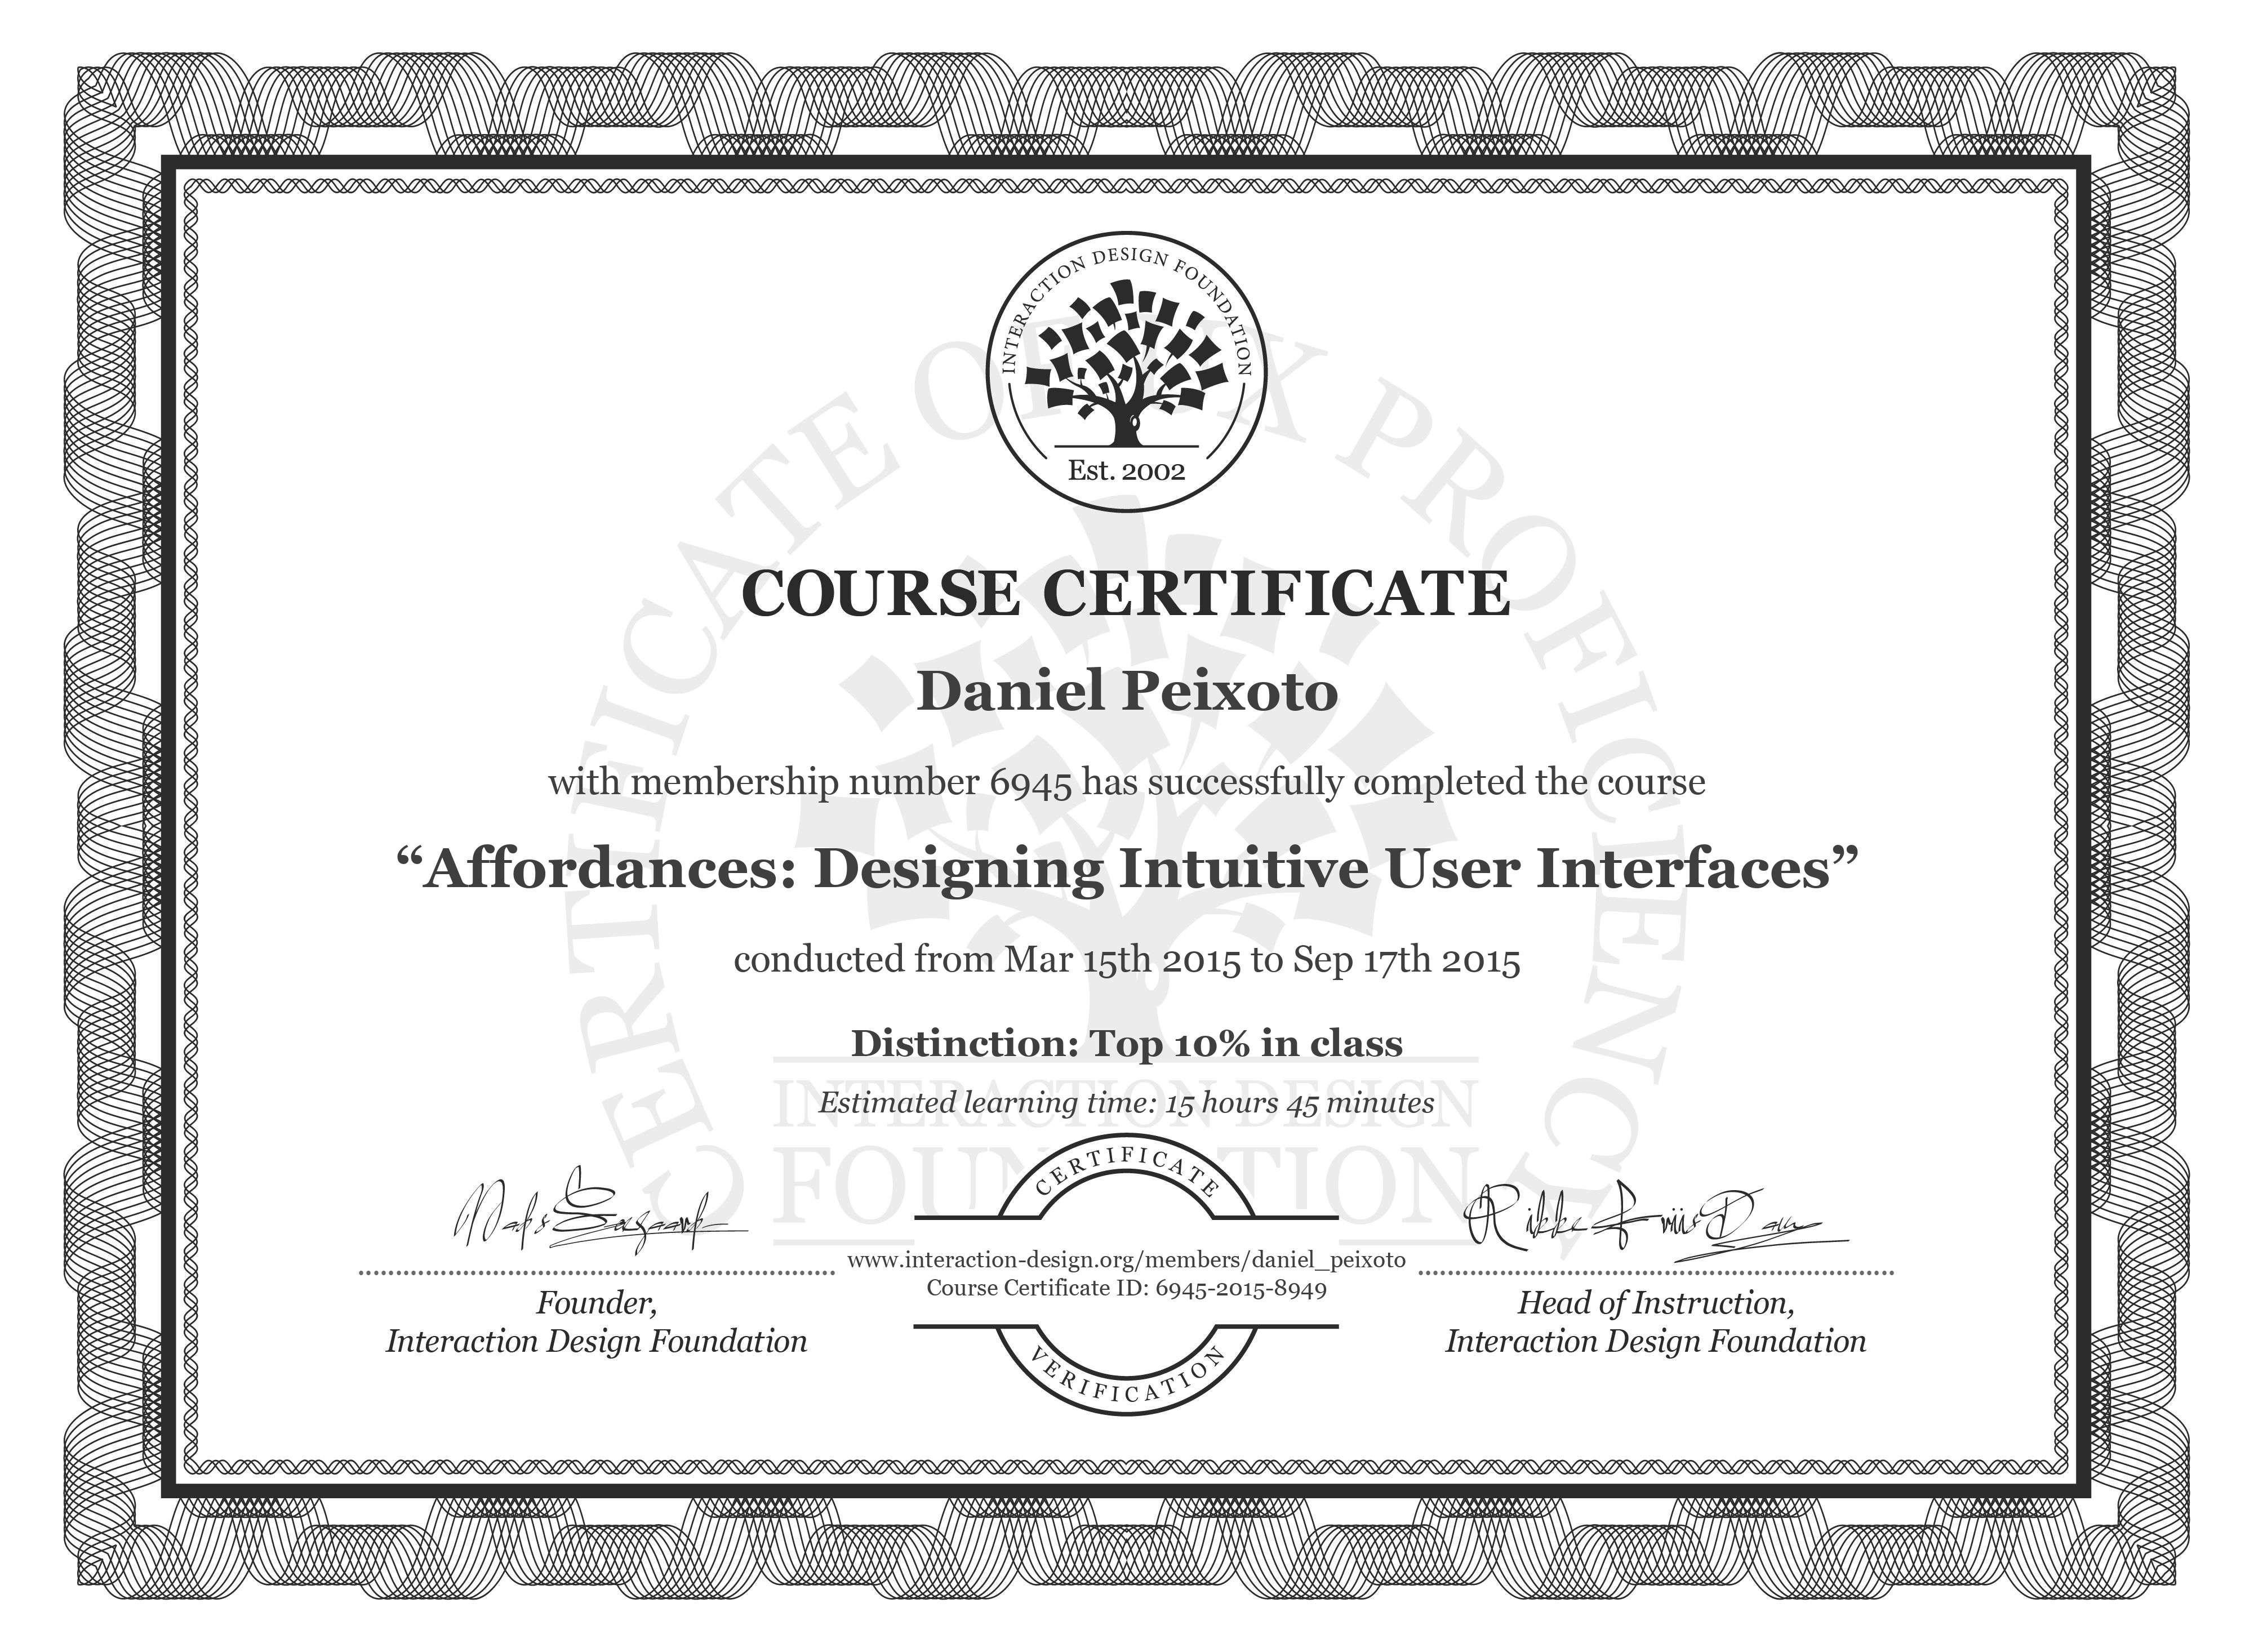 Daniel Peixoto's Course Certificate: Affordances: Designing Intuitive User Interfaces